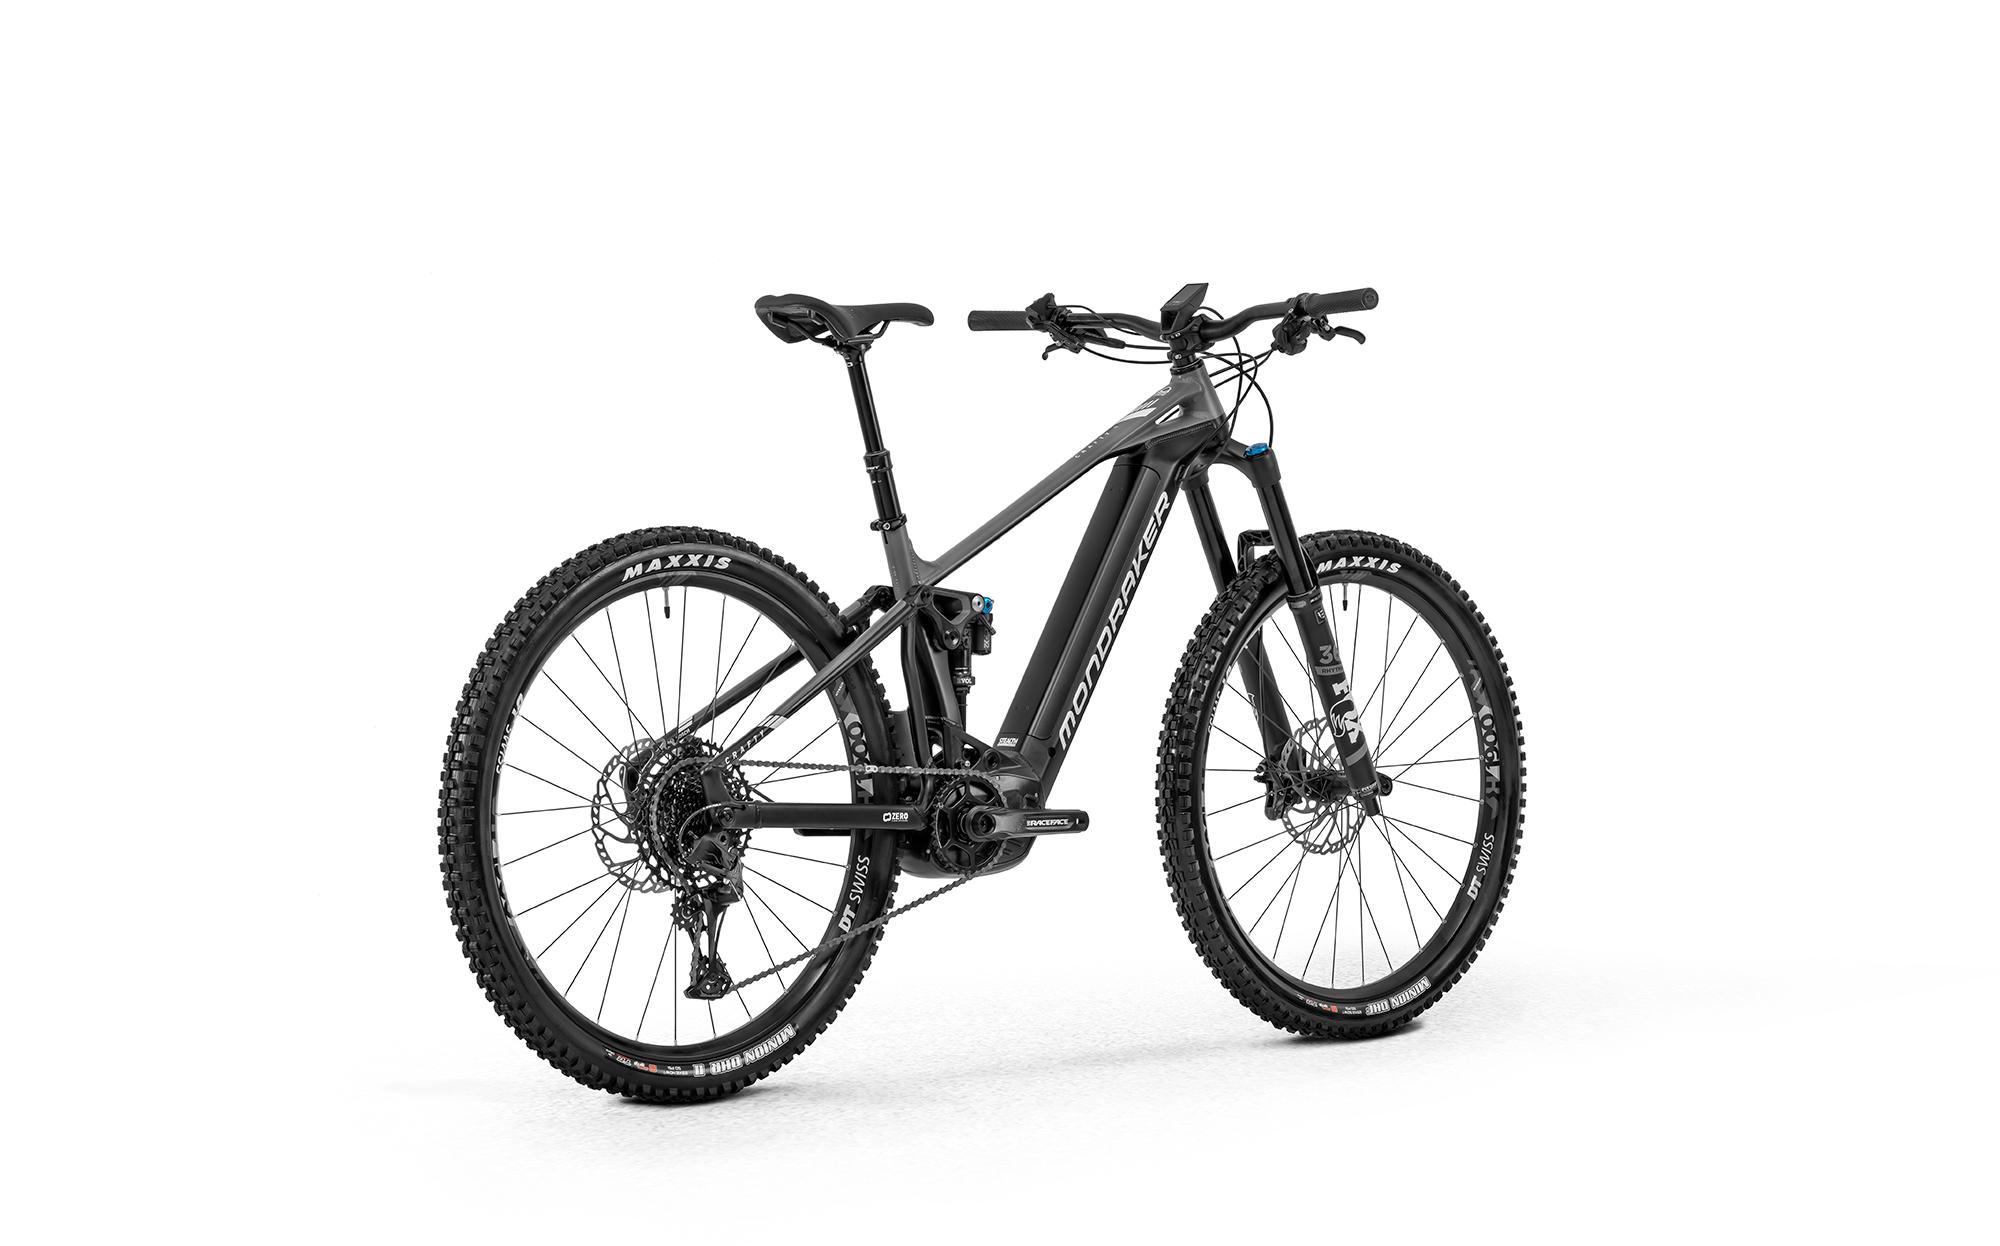 Crafty R 29, black/nimbus grey/white, 2020